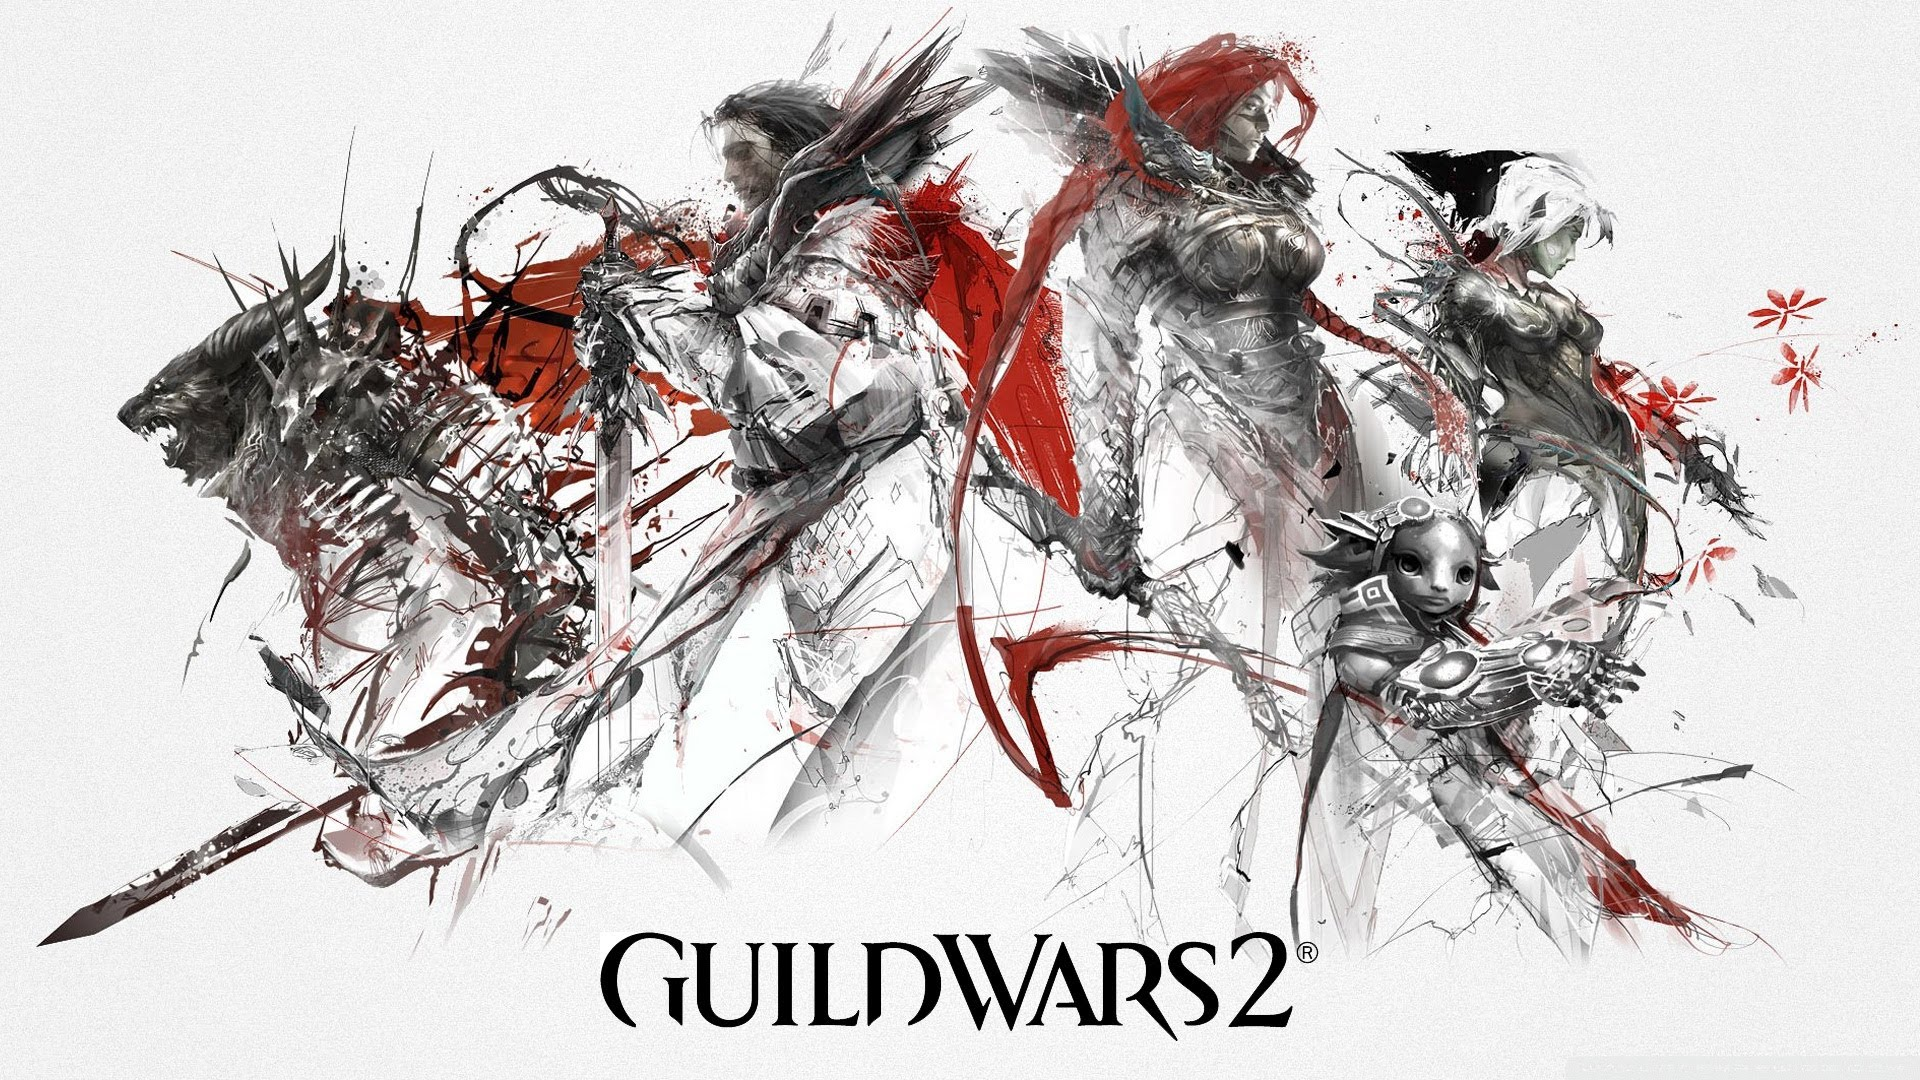 48+] Hd Guild Wars 2 Wallpaper on WallpaperSafari